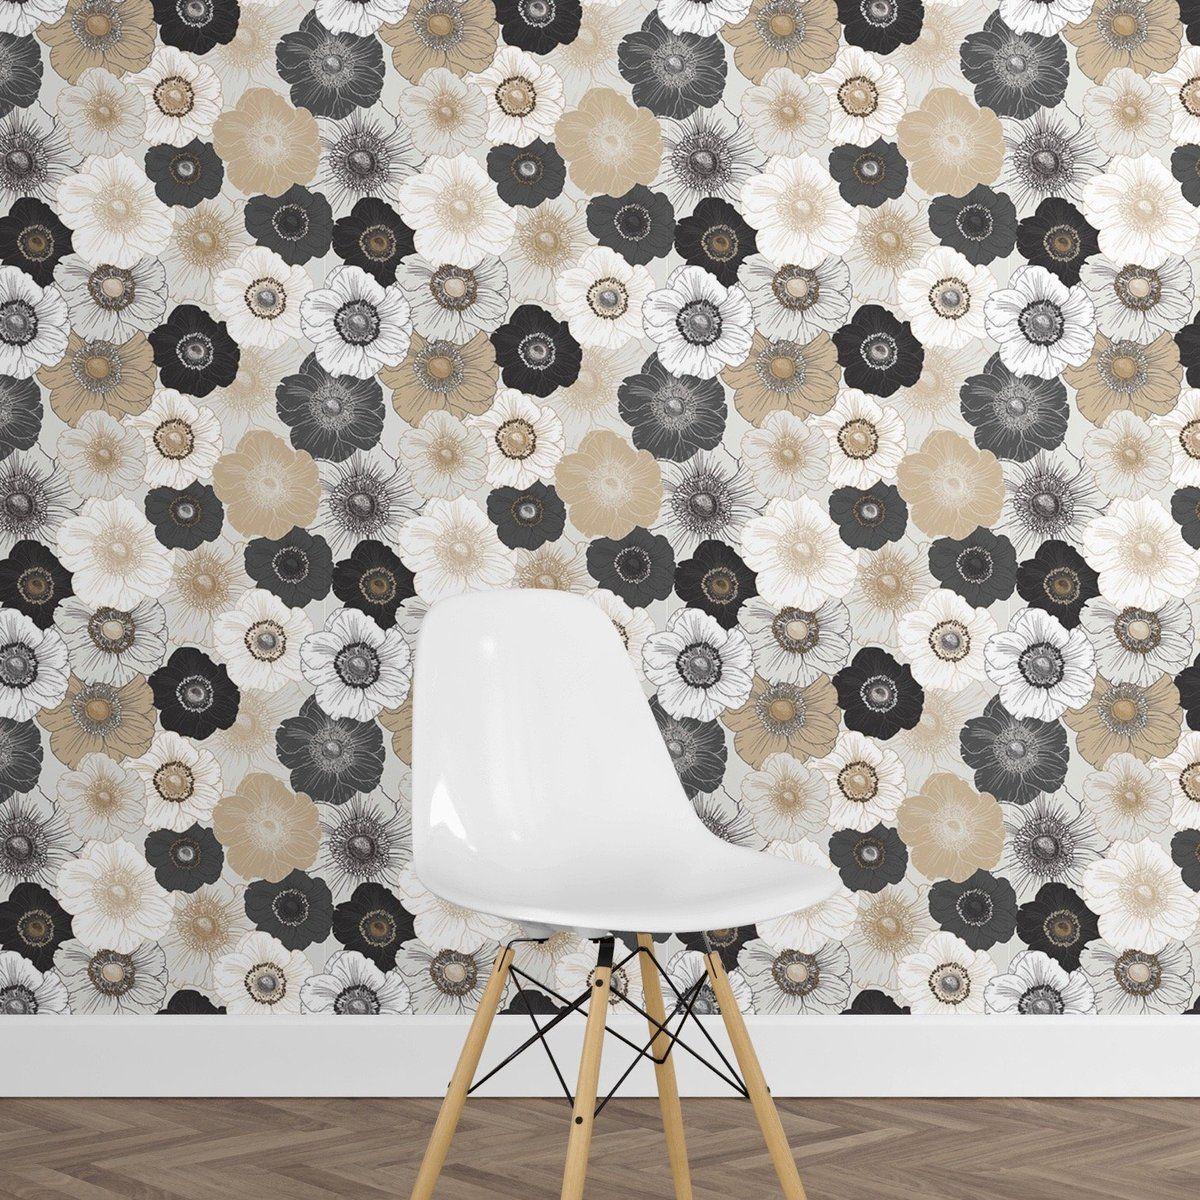 Anemones Peel And Stick Wallpaper Removable Wallpaper Brick Wallpaper Living Room